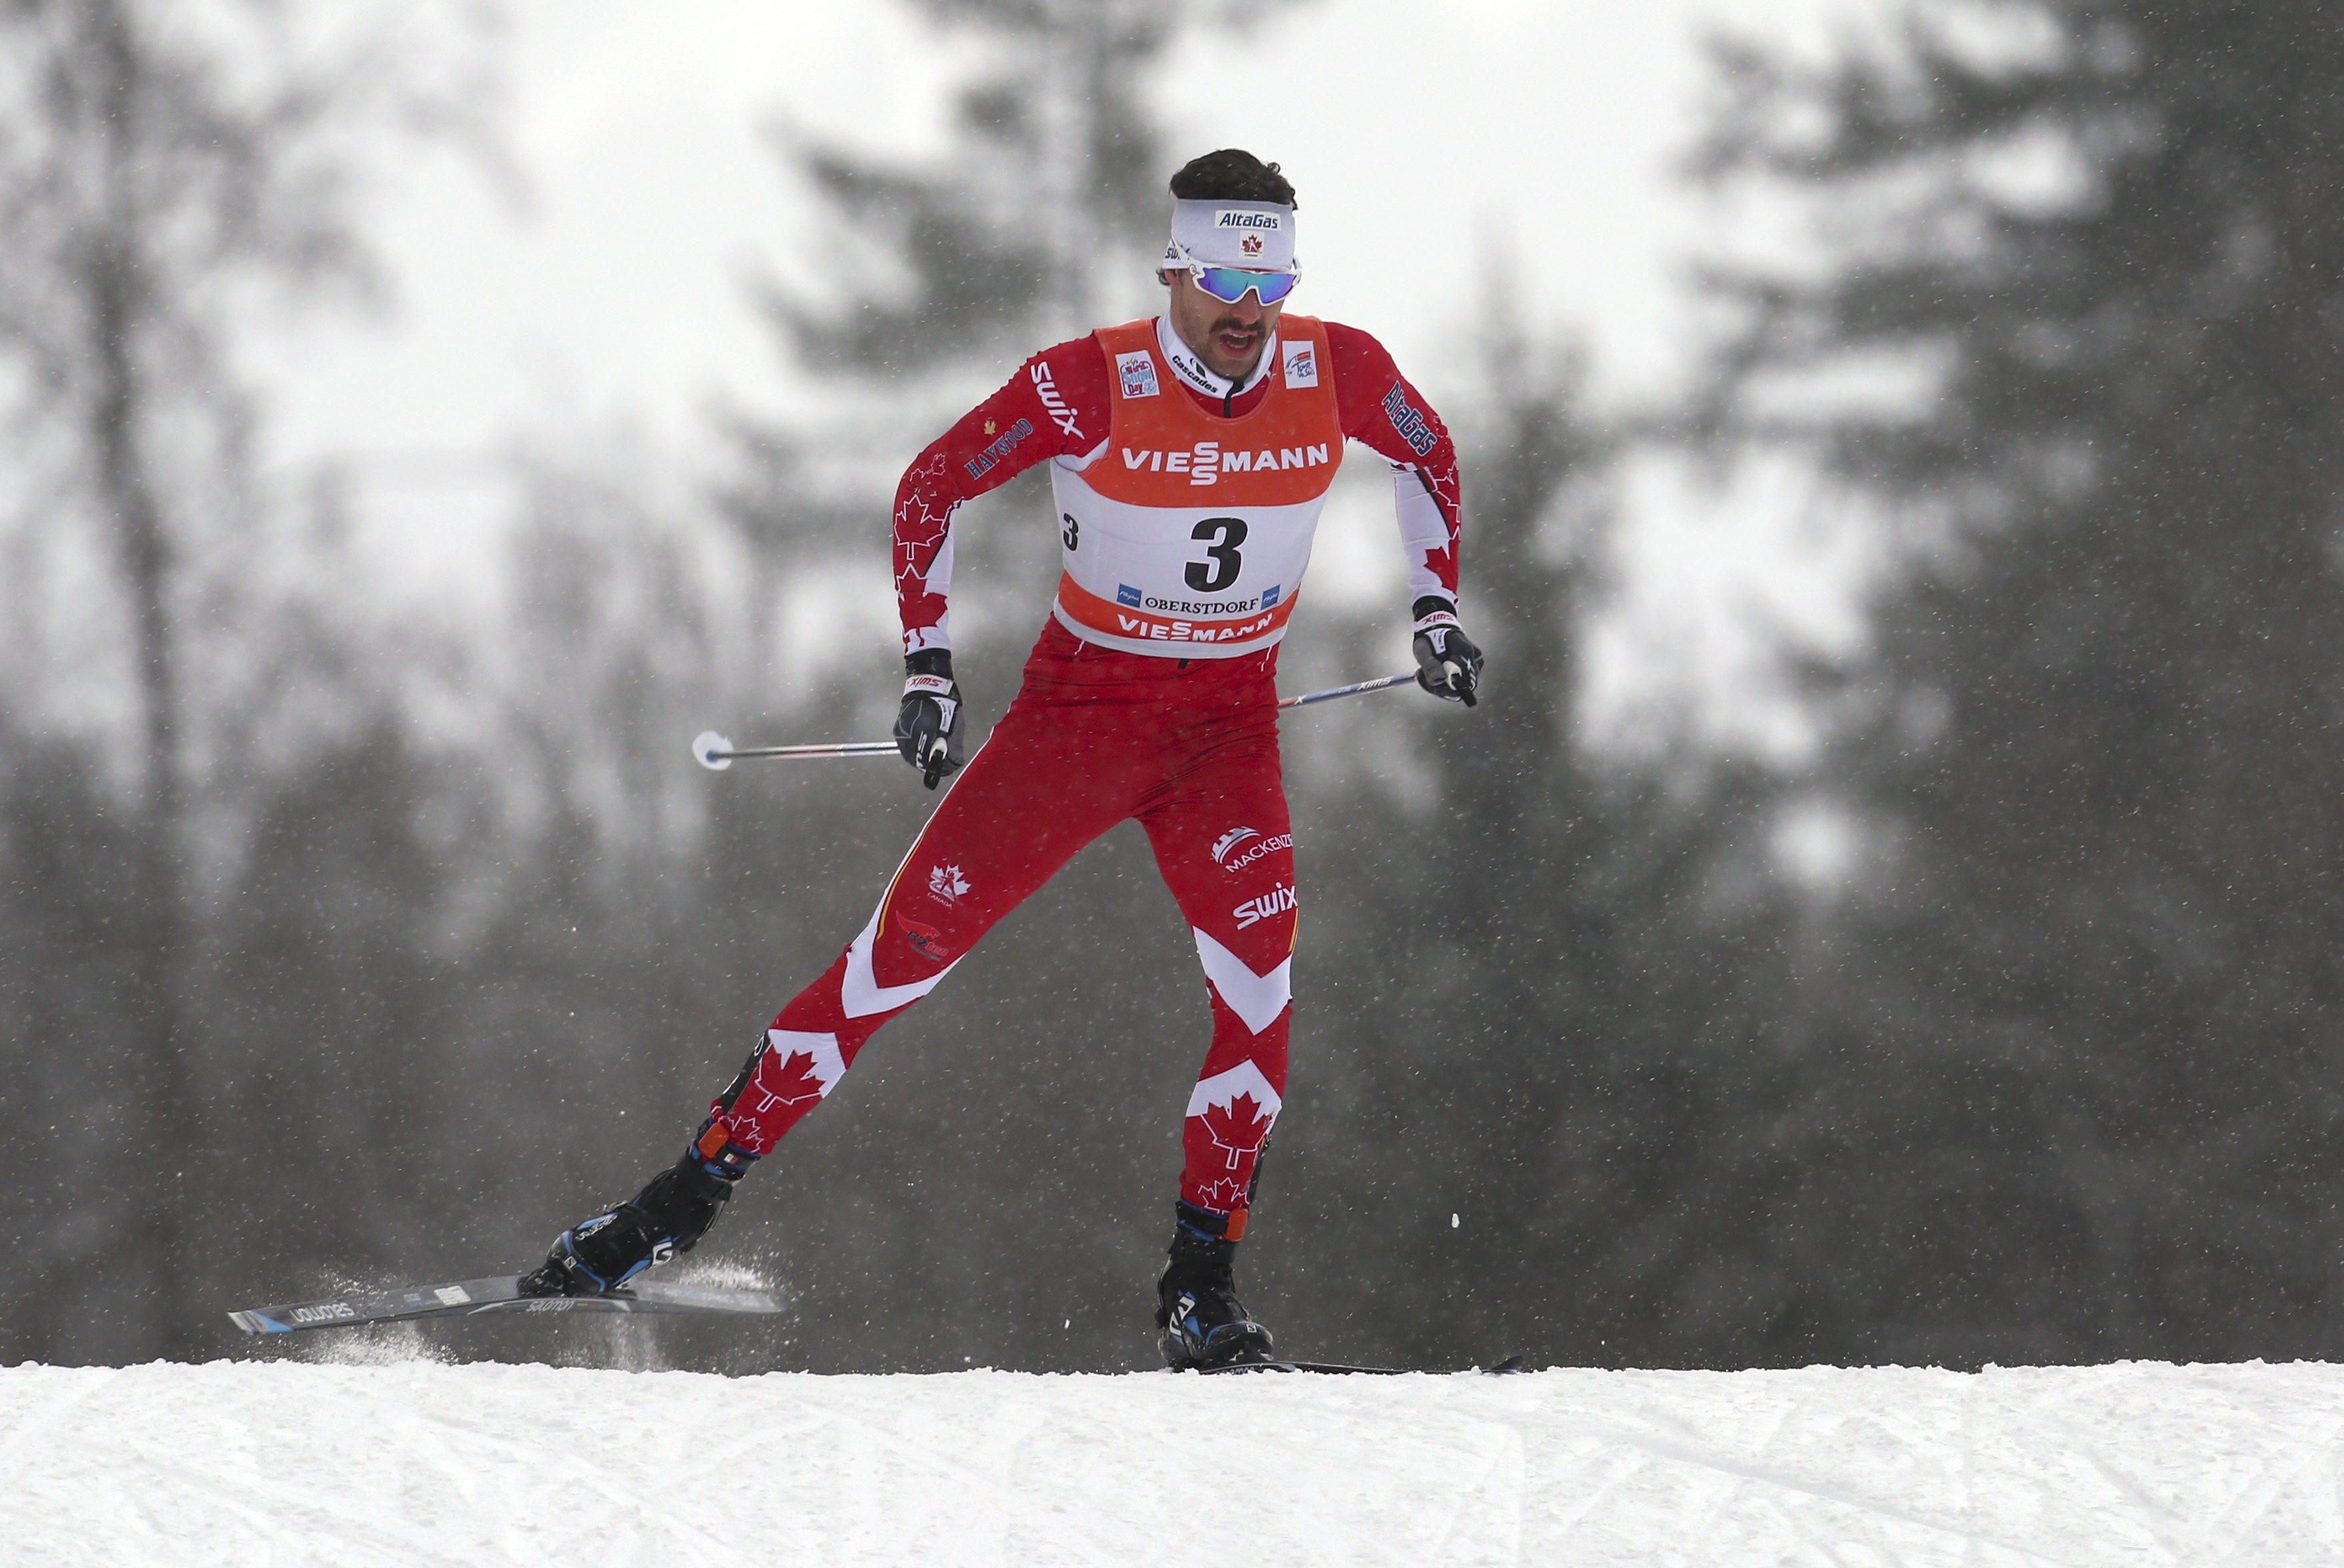 Alex Harvey of Canada skis during the men's pursuit race at the FIS Tour de Ski in Oberstdorf, Germany, Wednesday, Jan. 4, 2017. ( Karl-Josef Hildenbrand/dpa via AP)